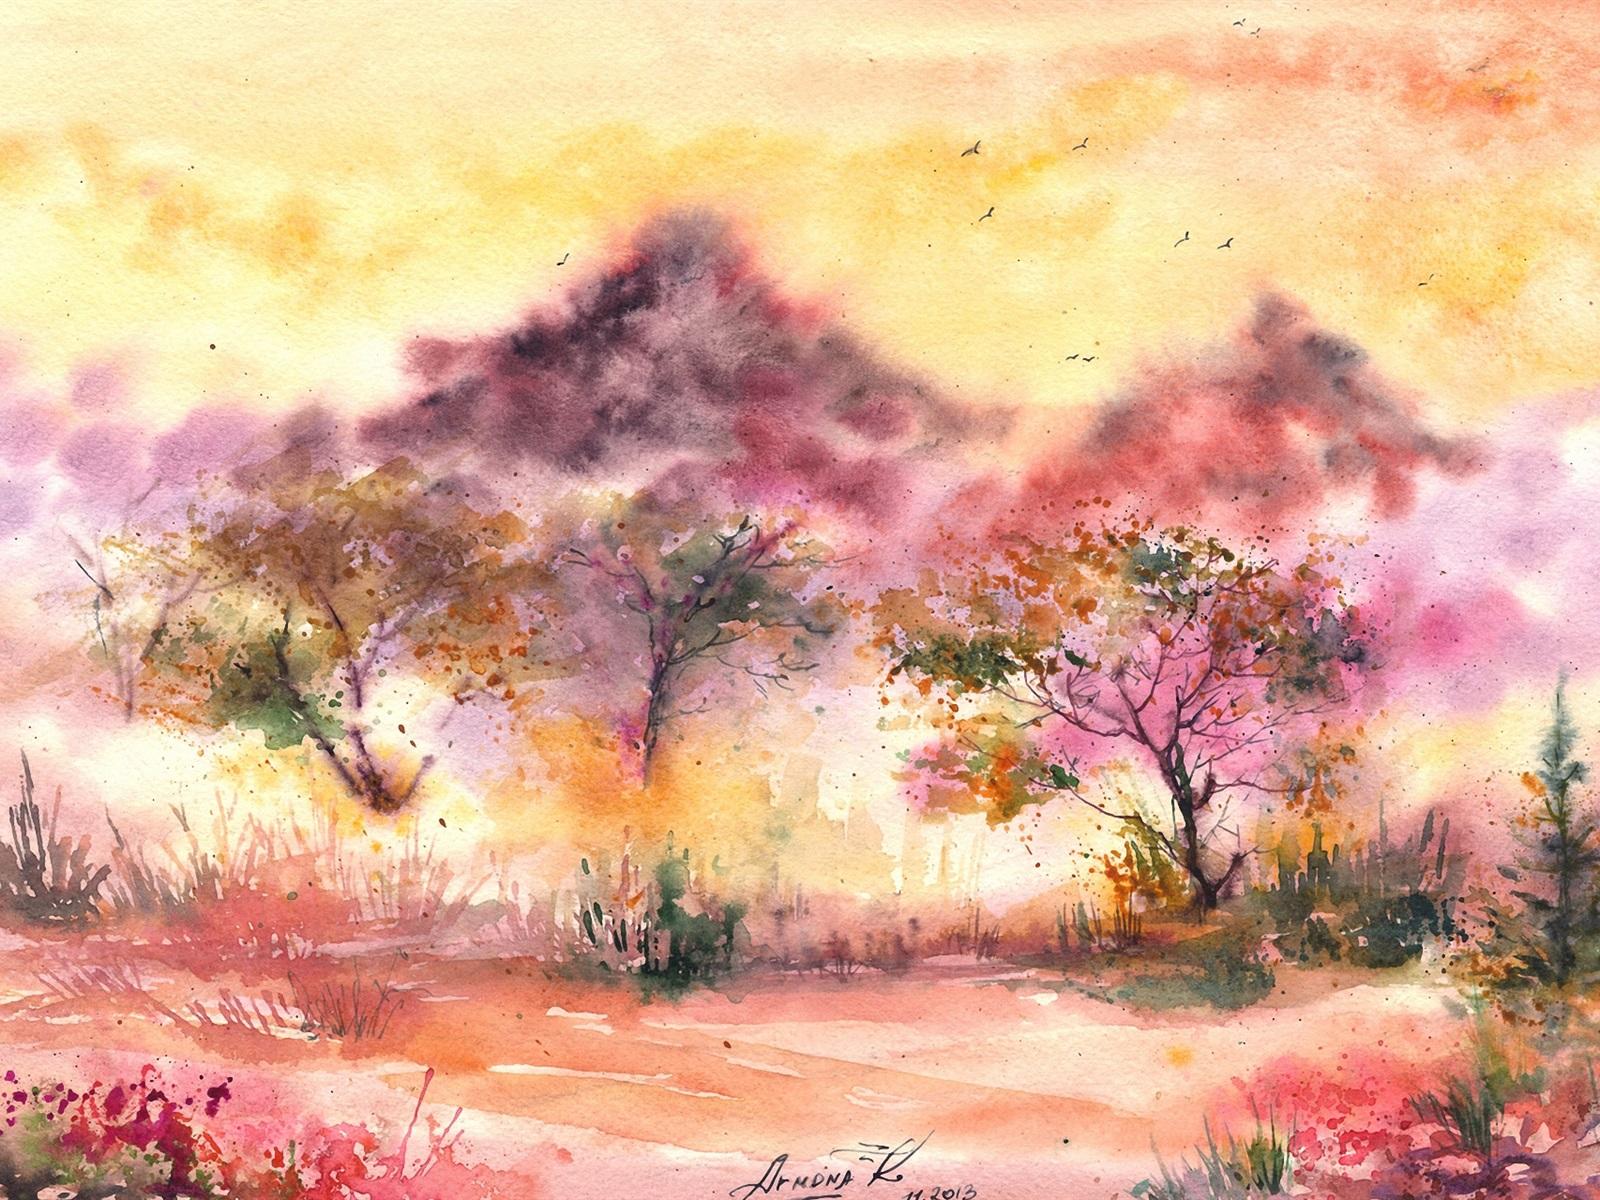 Download Wallpaper 1600x1200 Watercolor painting ...